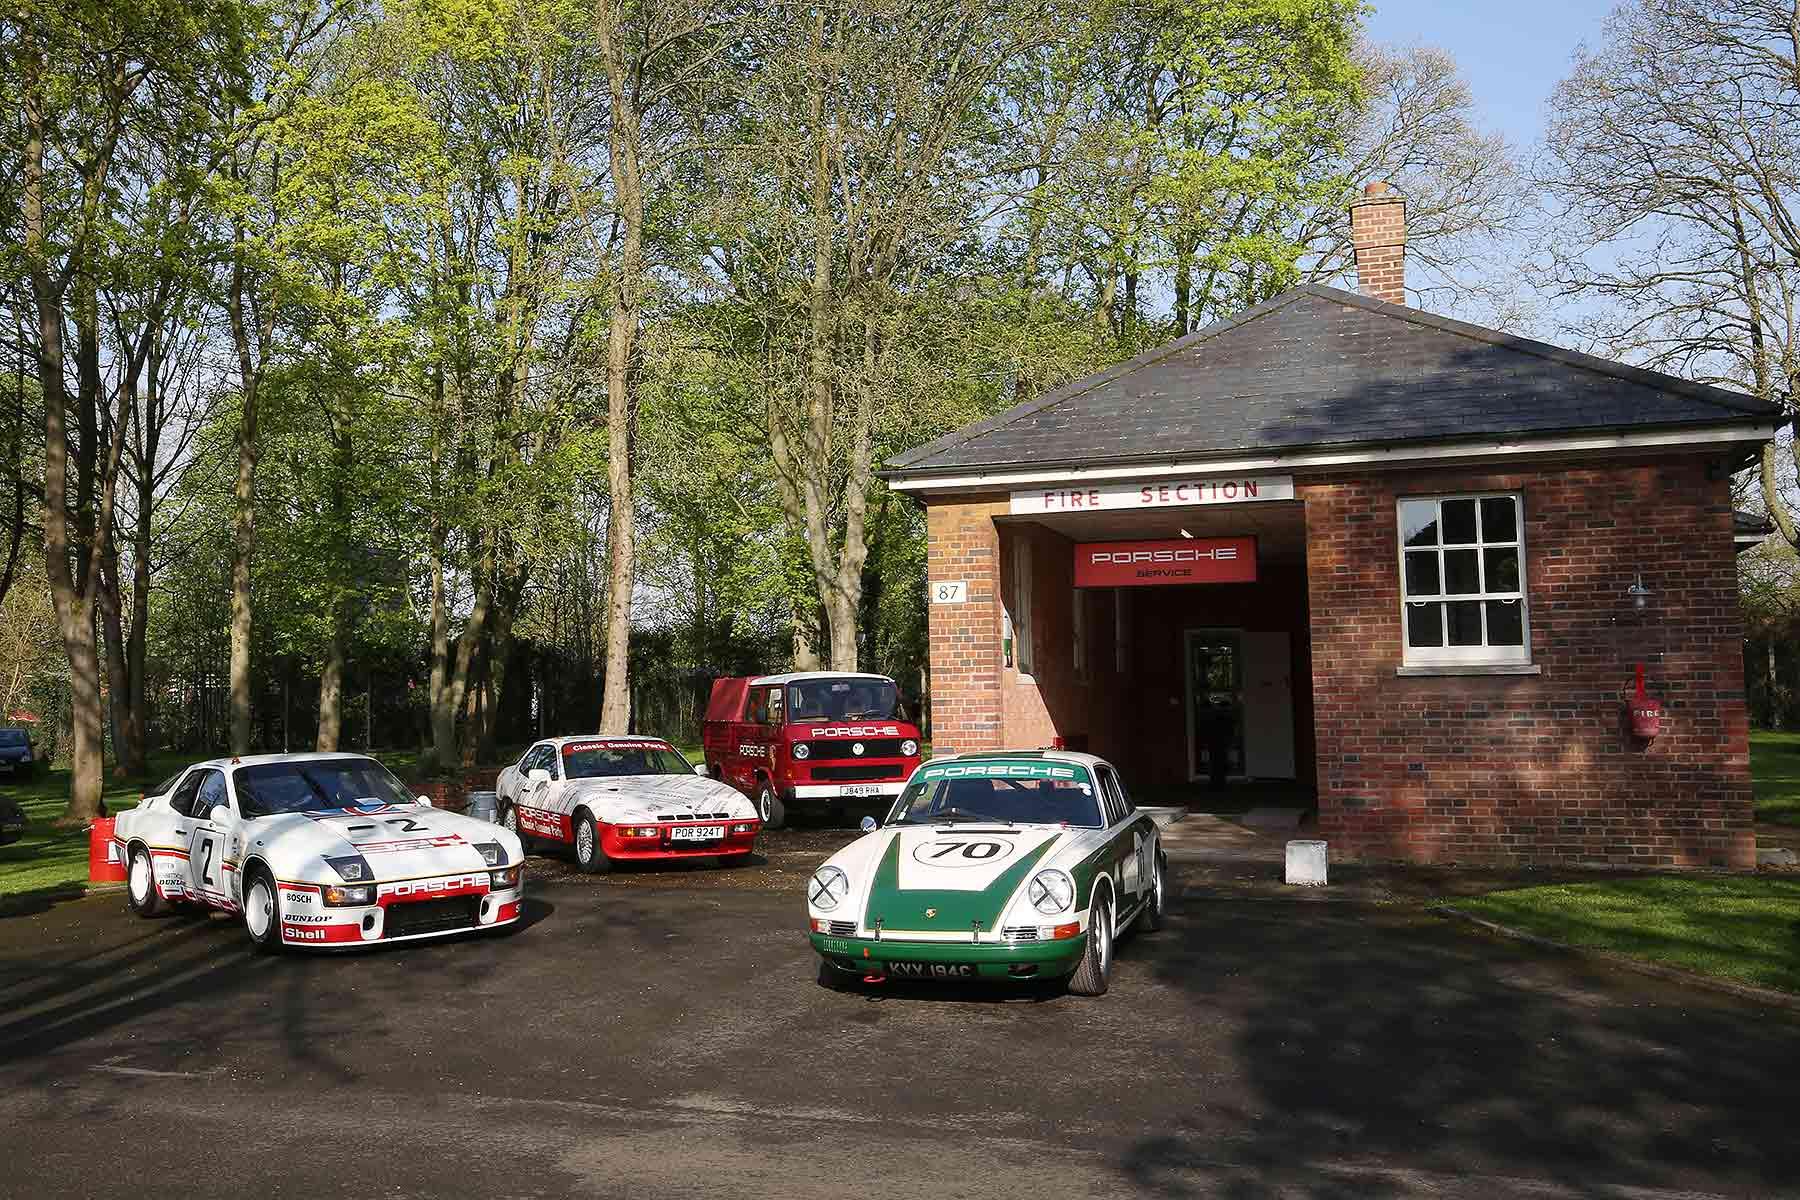 Porsche Classic Life pop-up shop